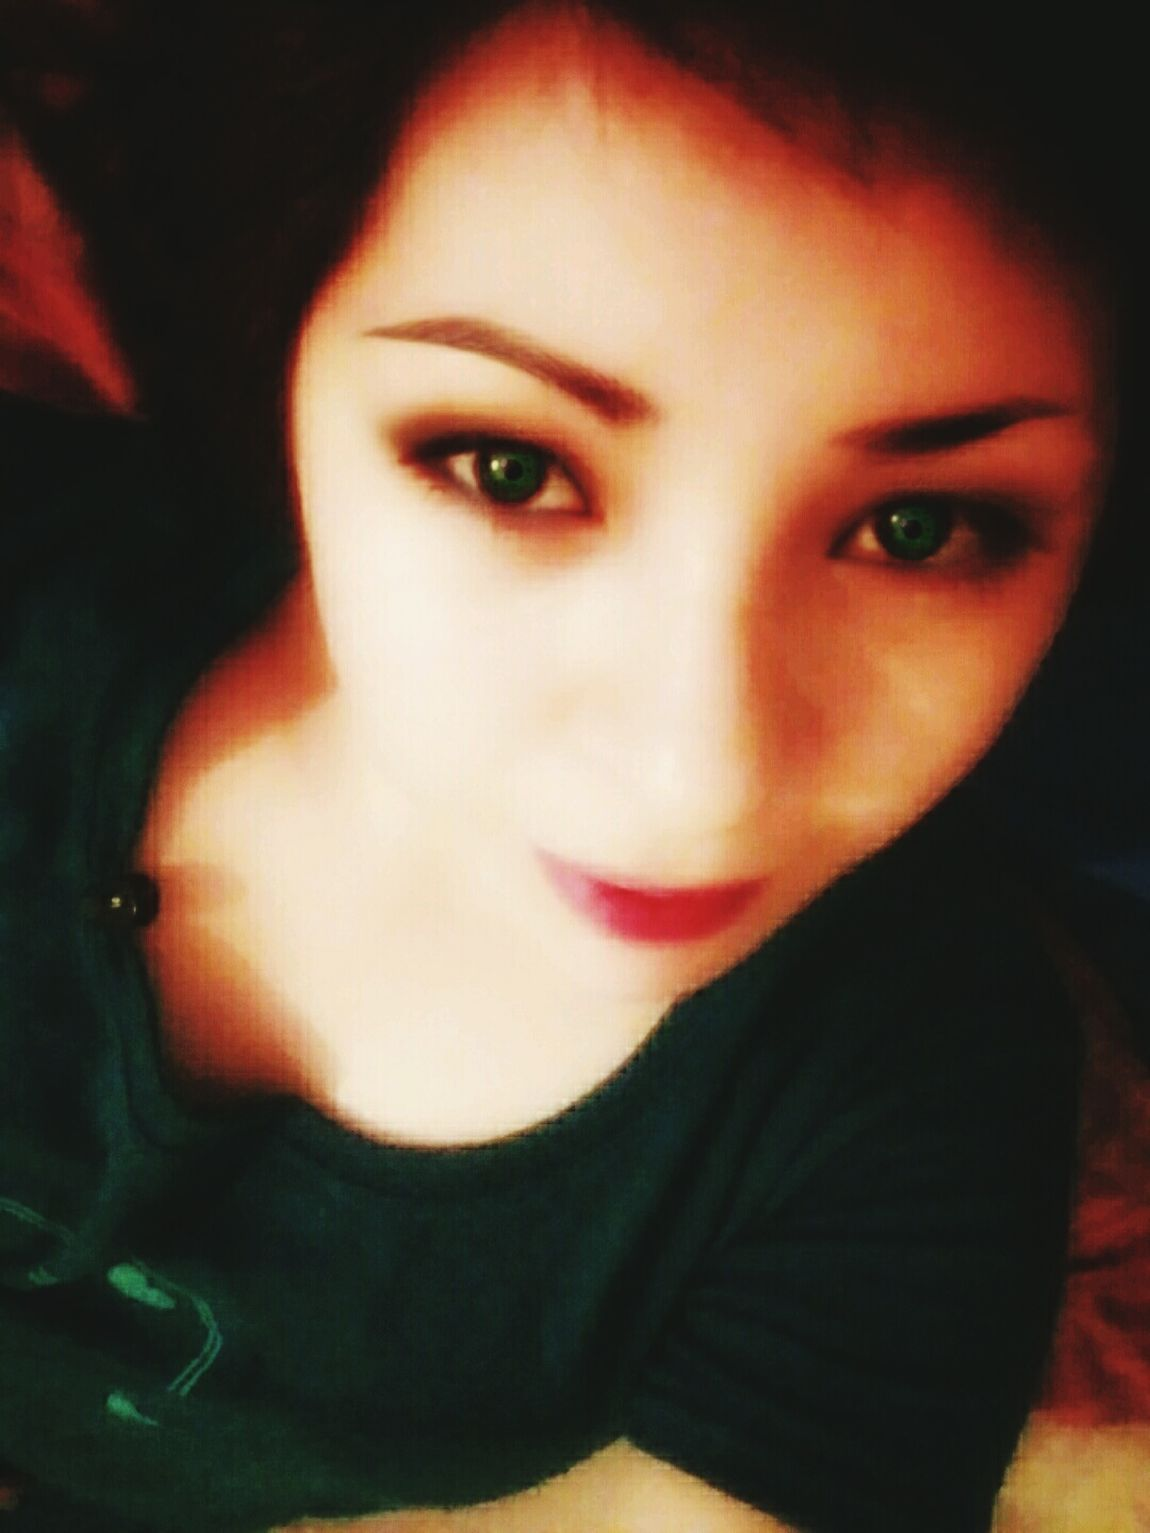 Taking Photos Relaxing Makeupartist Look Me In The Eyes Selfie ✌ Enjoying Life Beautiful Girl Hello World ✌ Model Pose Green Eyes Eyedoll Eyes Watching You